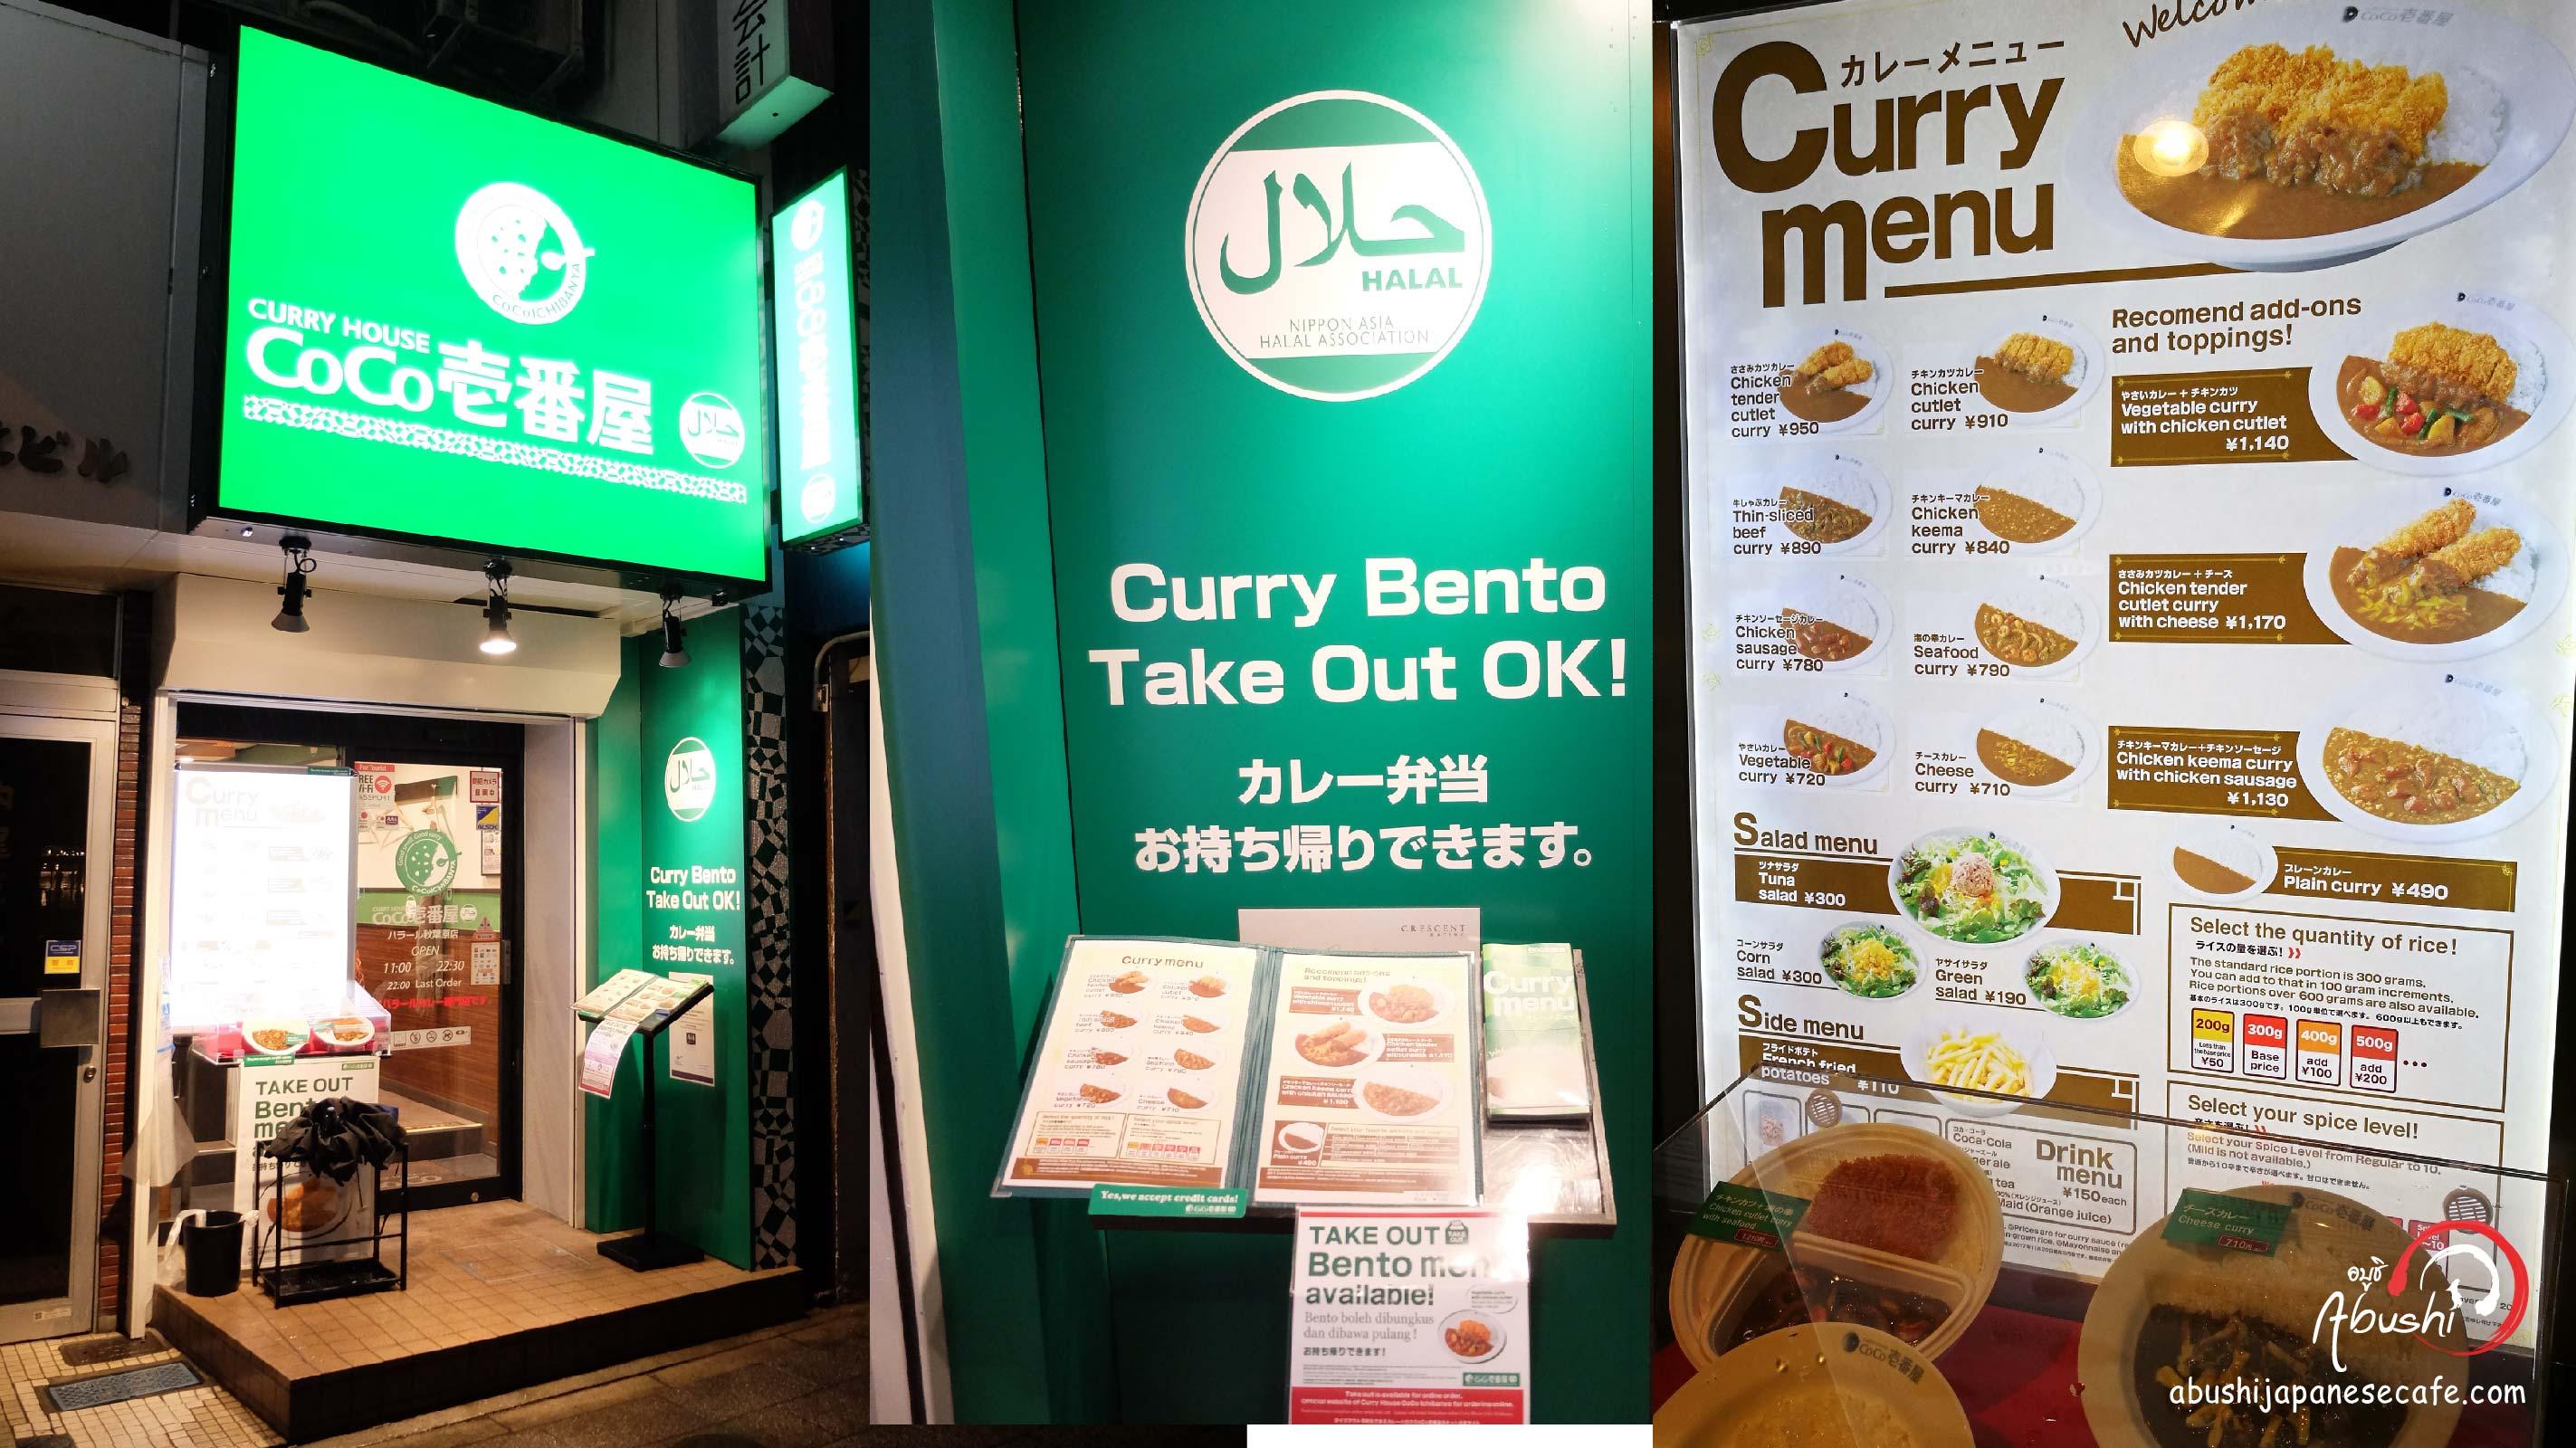 tokyo halal trip March2018 Abusi พากินพาเที่ยวแบบฮาลาลที่ญี่ปุ่น coco curry house